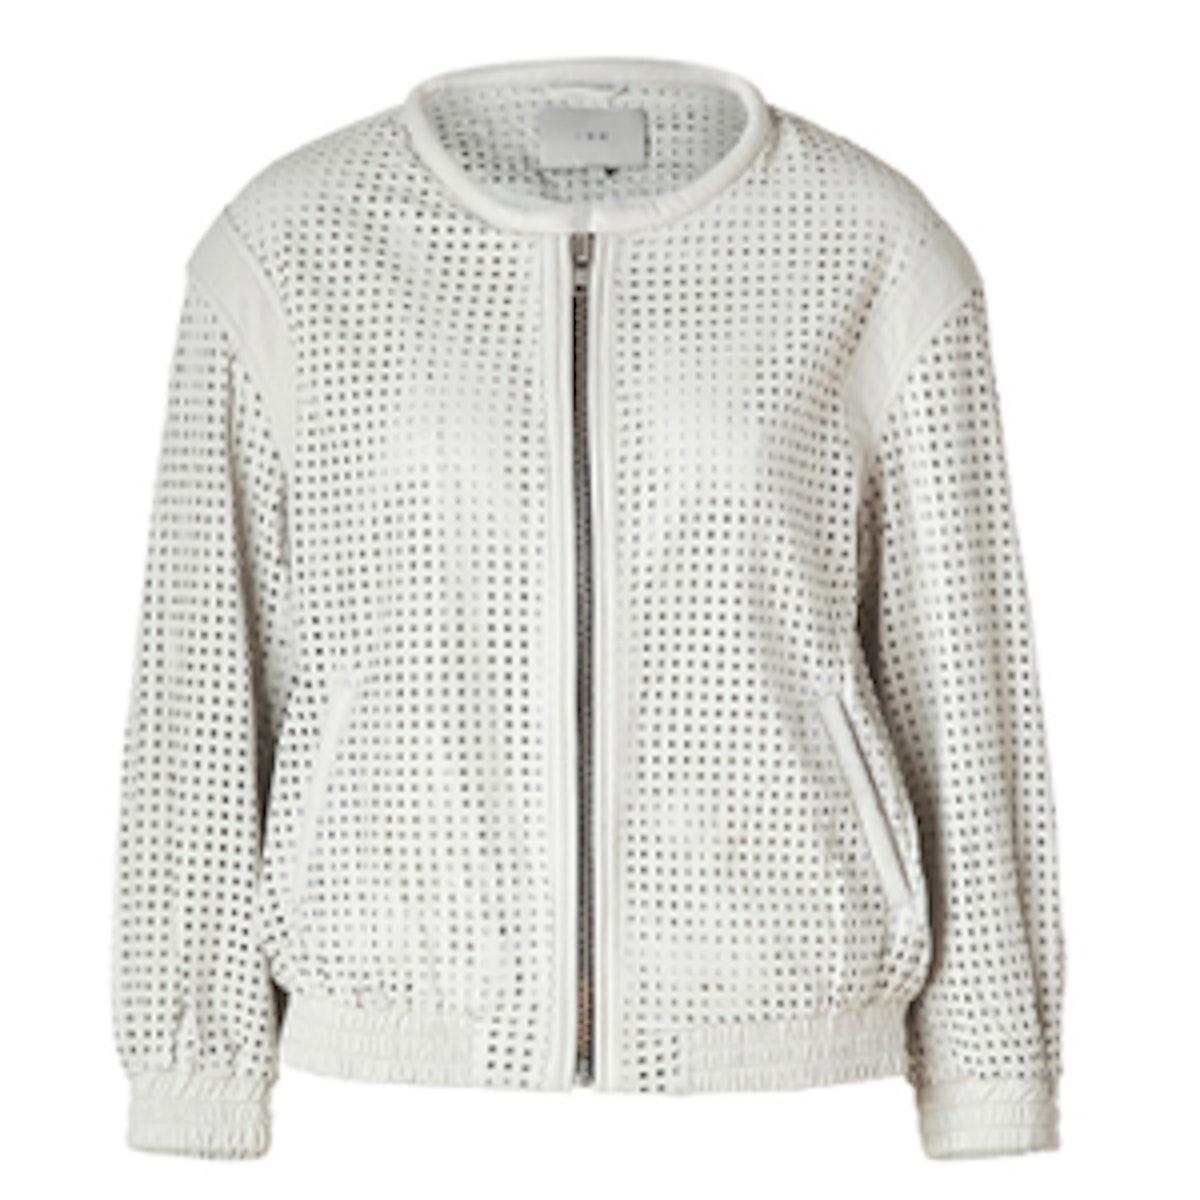 White Perforated Biker Jacket